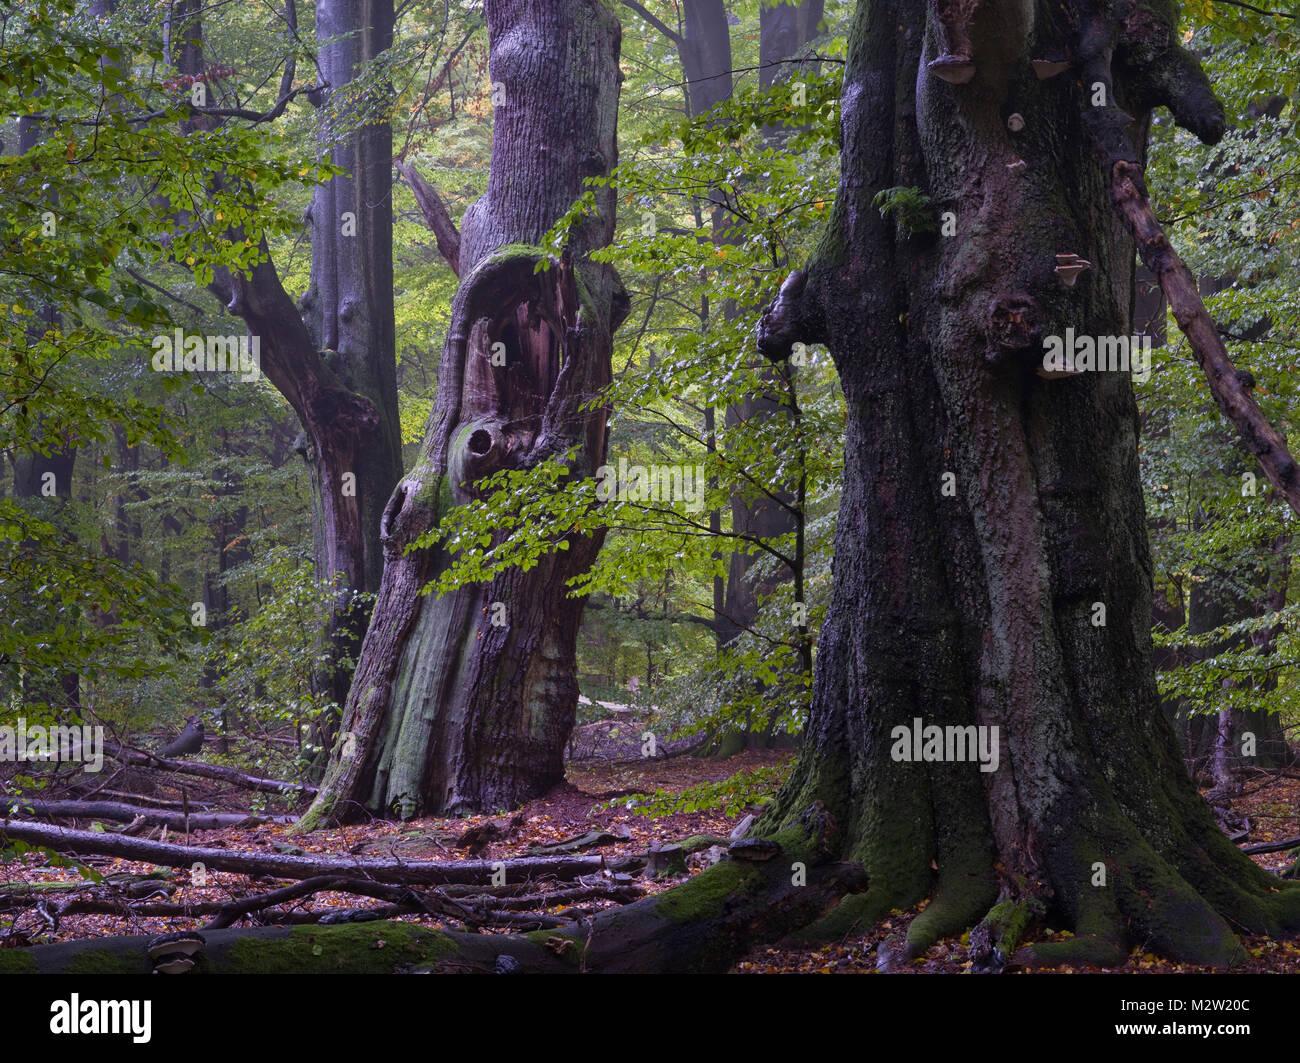 Old beeches, Urwald Sababurg, Reinhardswald, Hessen - Stock Image